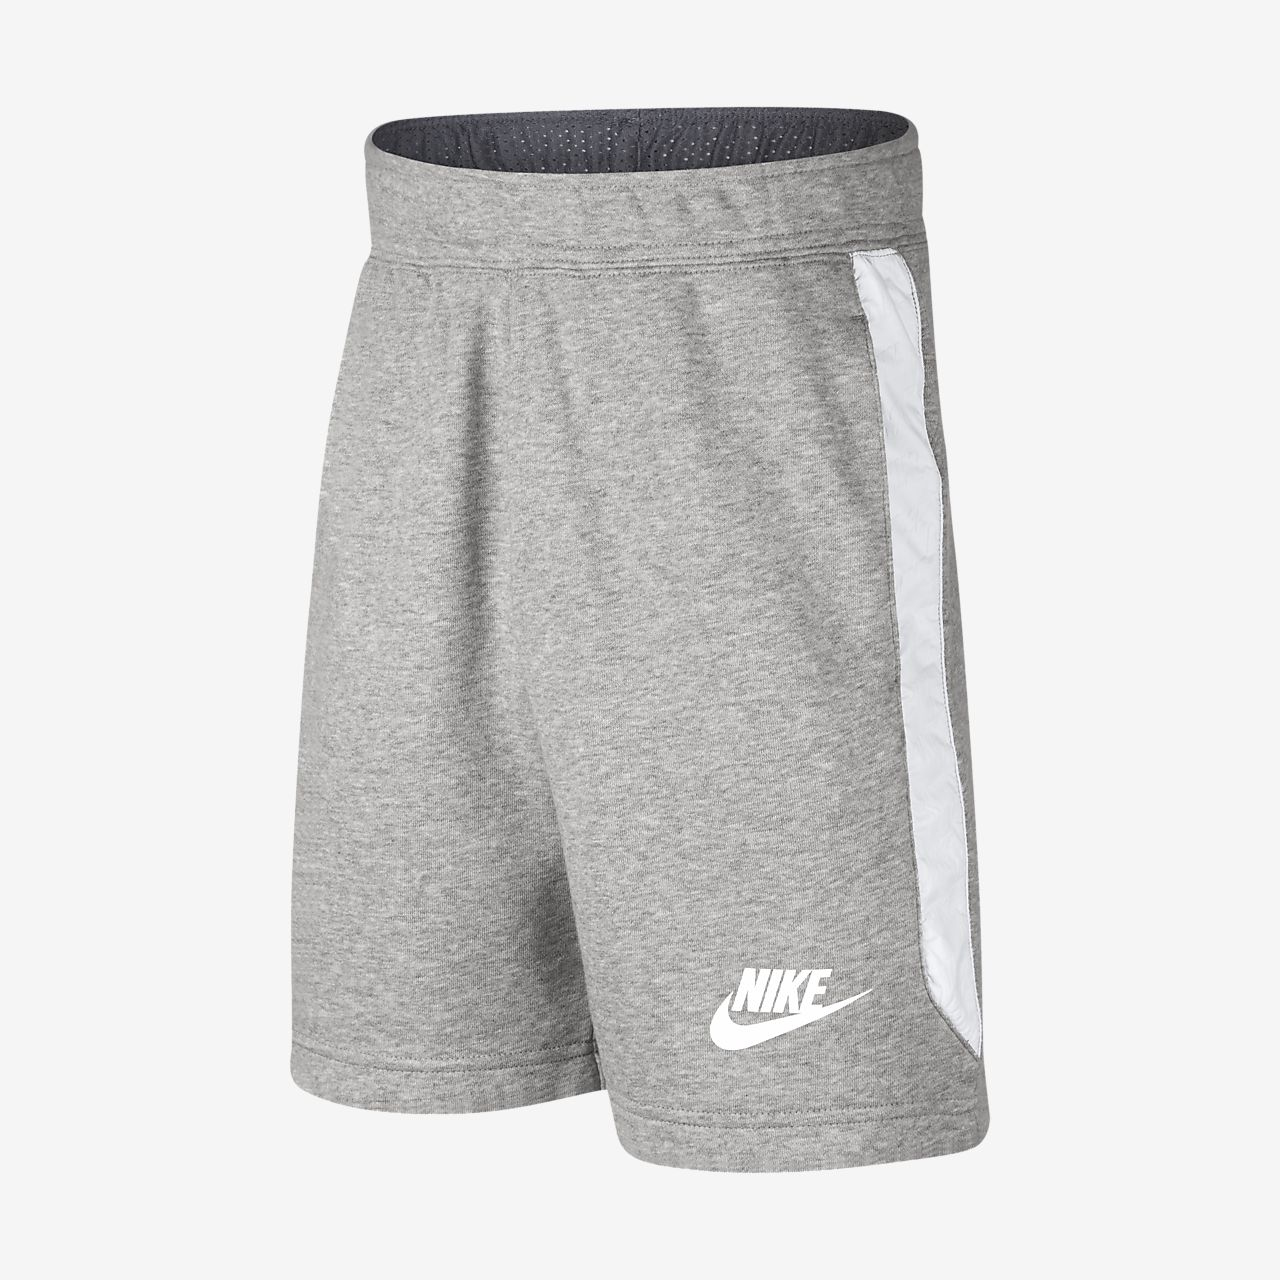 Nike Sportswear Older Kids\u0027 (Boys\u0027) Shorts